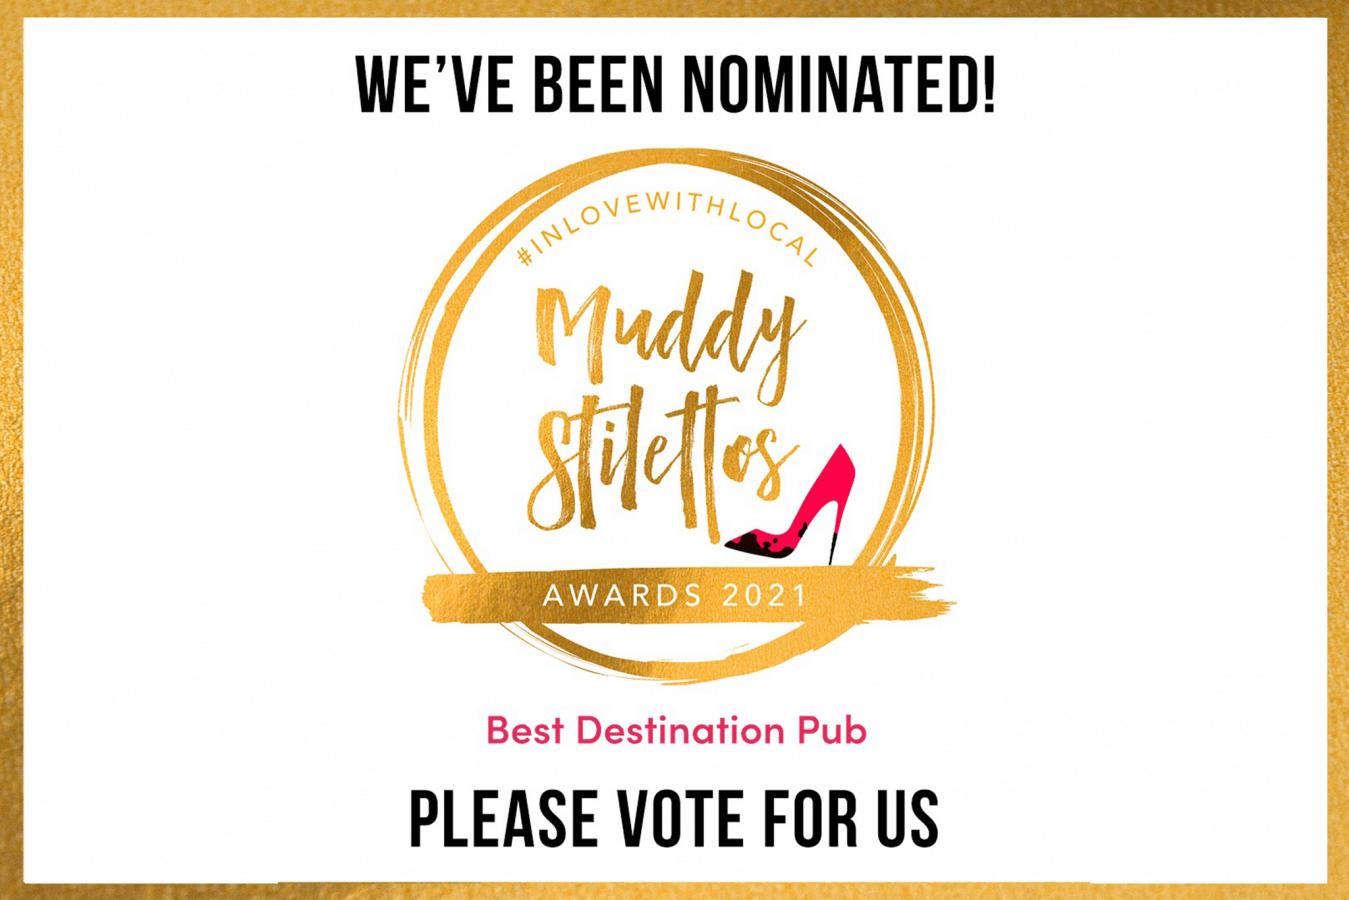 Muddy Stilettos nomination Royal Oak Withypool